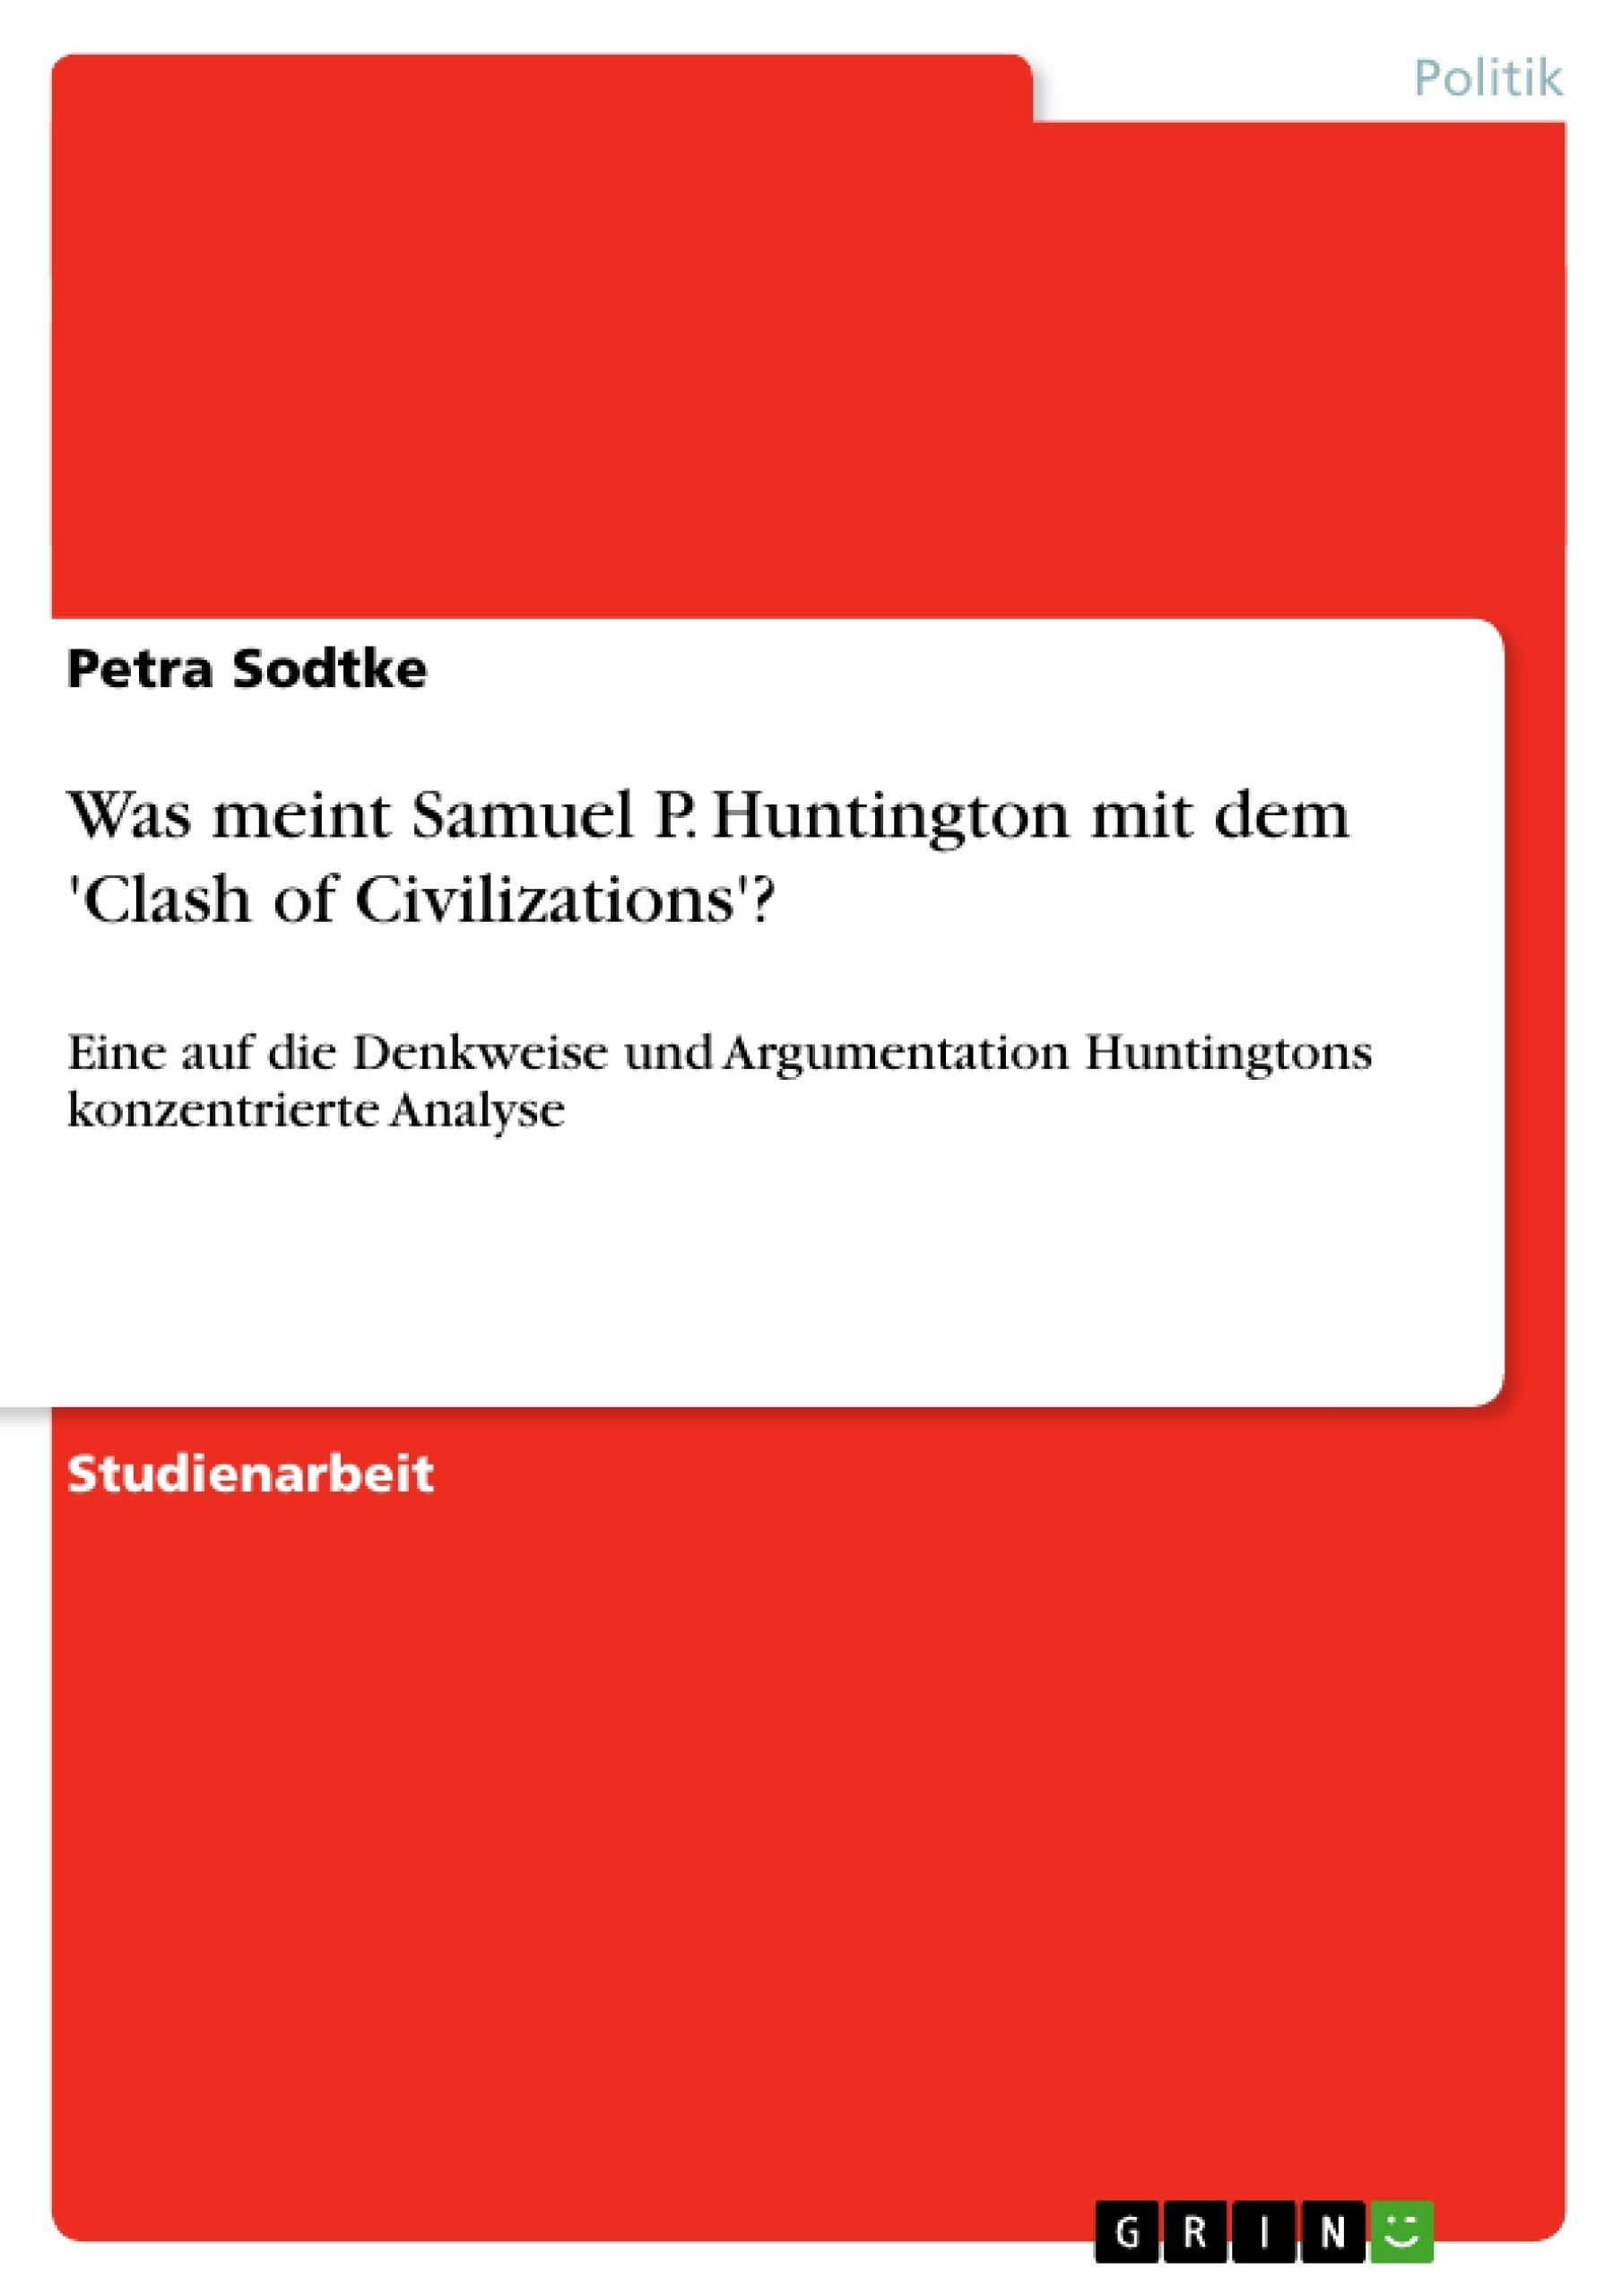 Titel: Was meint Samuel P. Huntington mit dem 'Clash of Civilizations'?